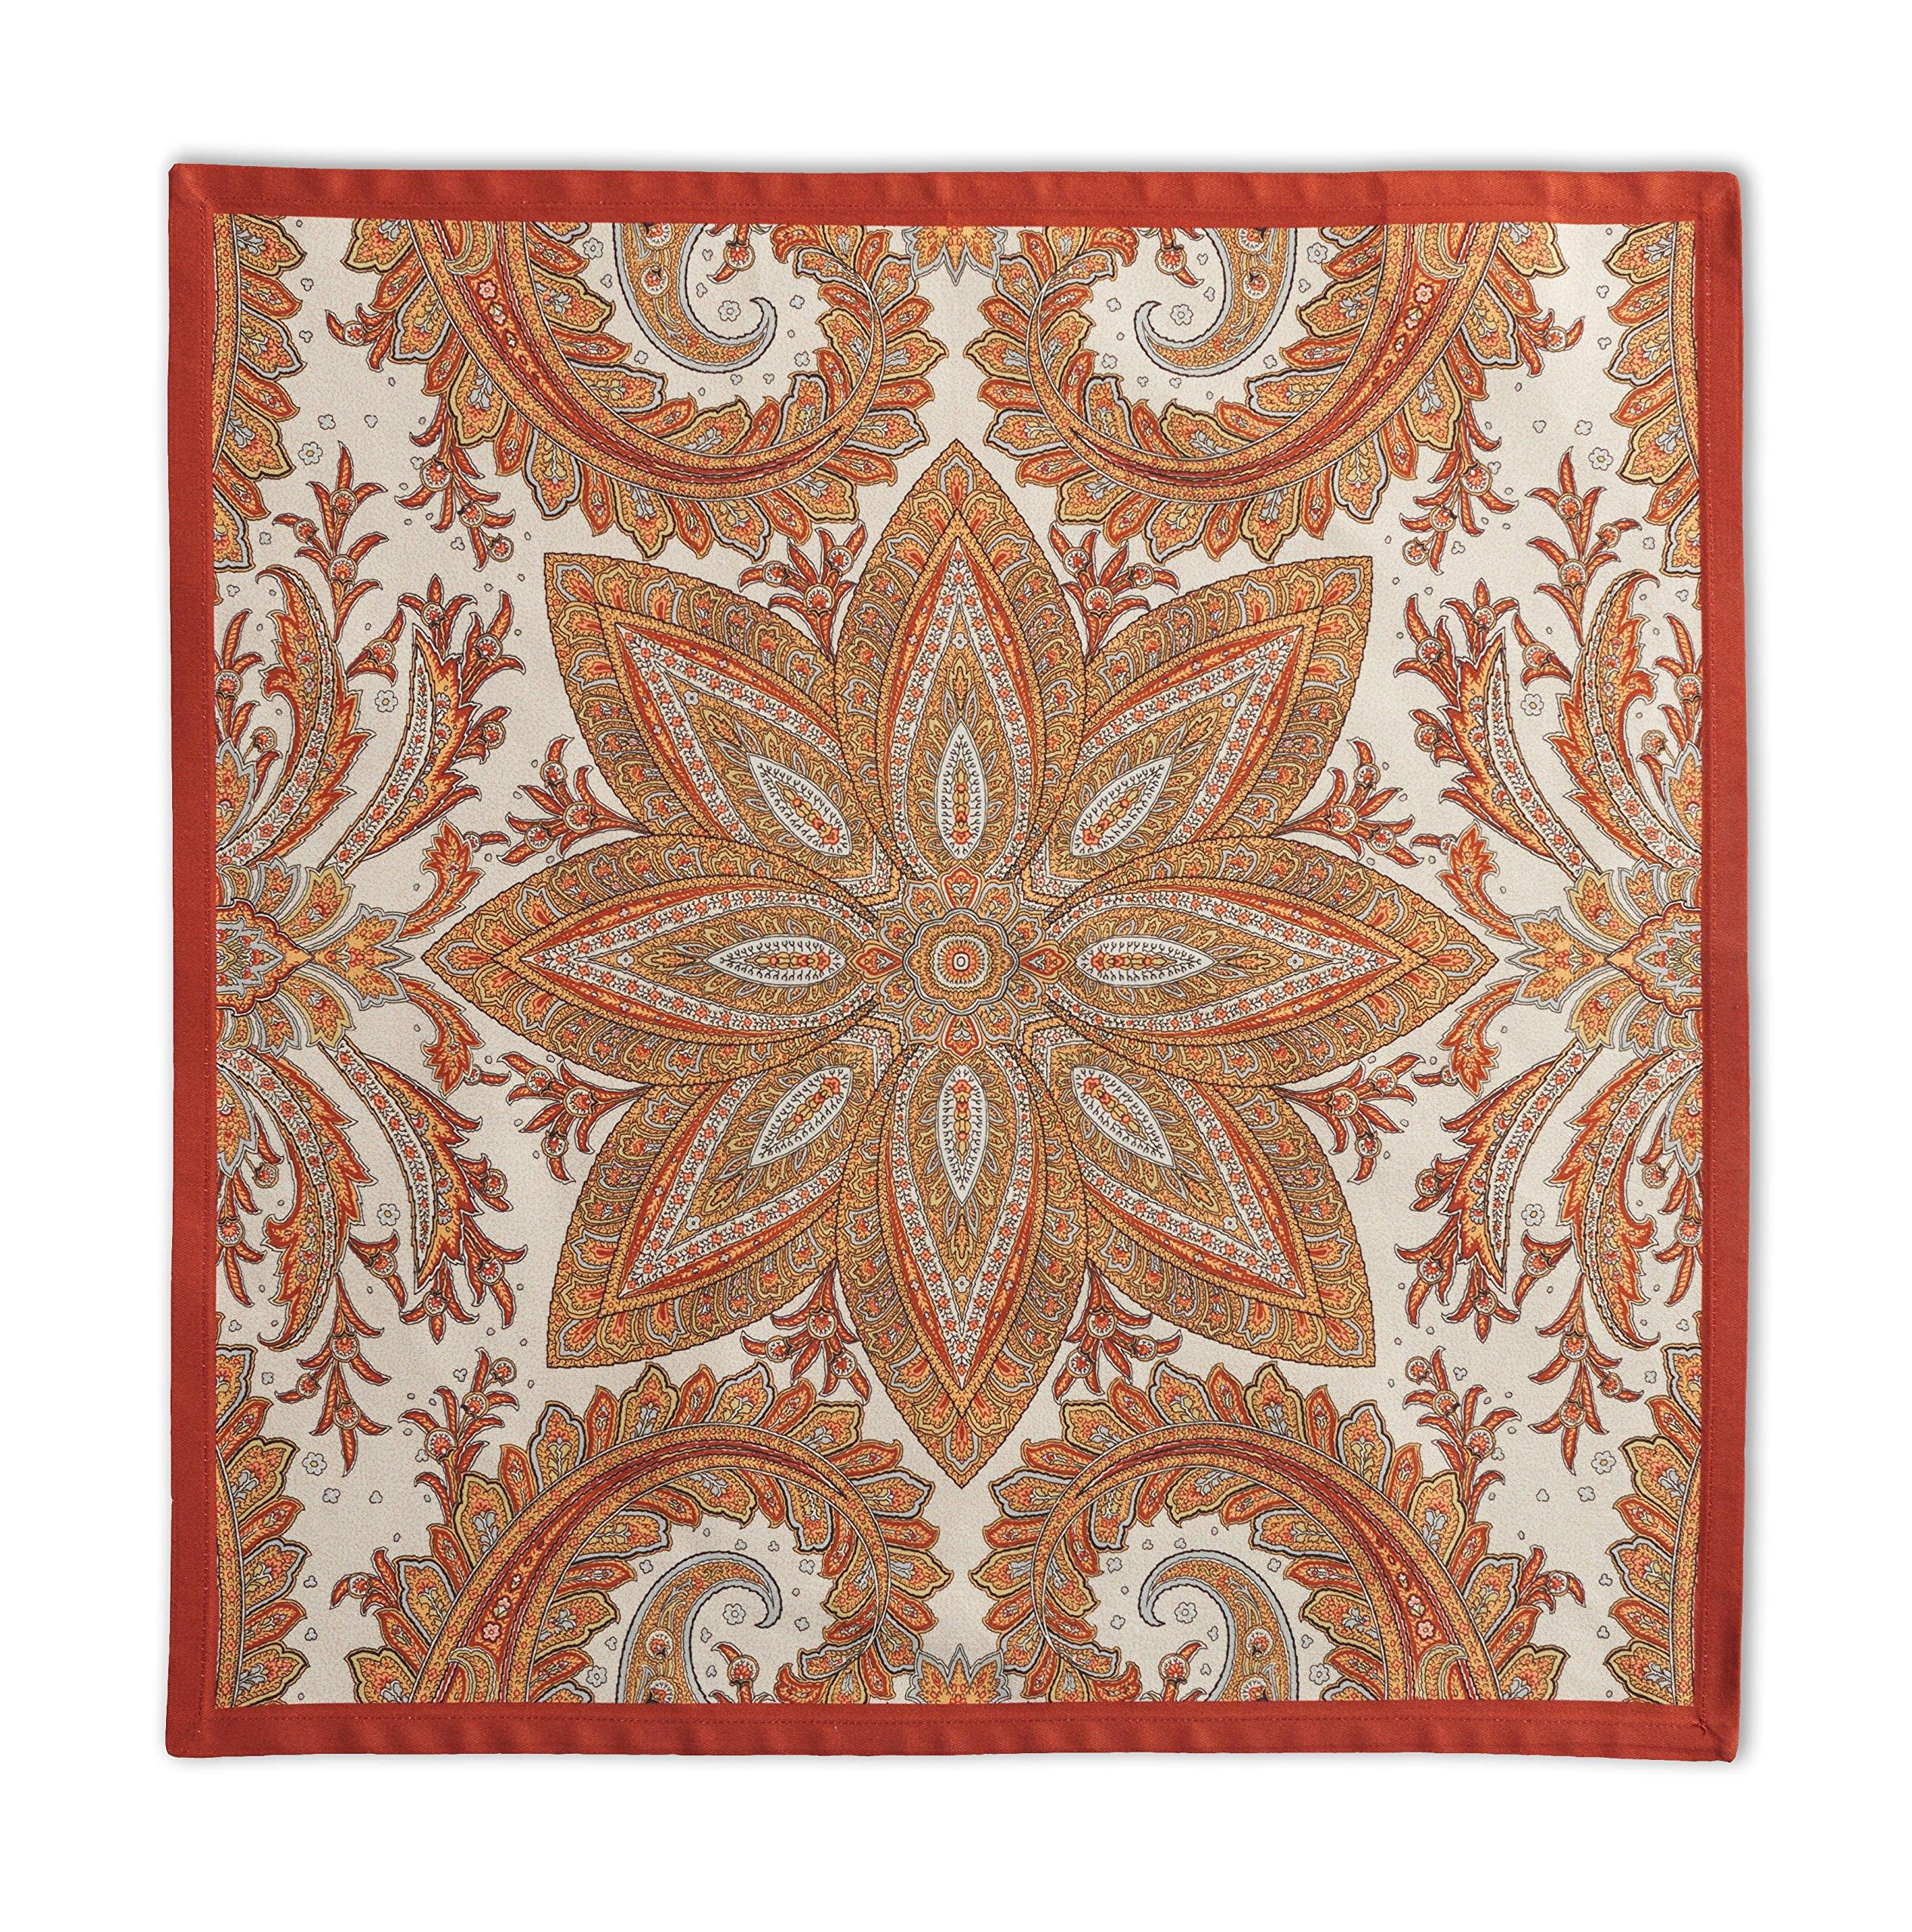 Maison d' Hermine Kashmir Paisley 100% Cotton Set of 4 Napkins, 20 - inch by 20 - inch.